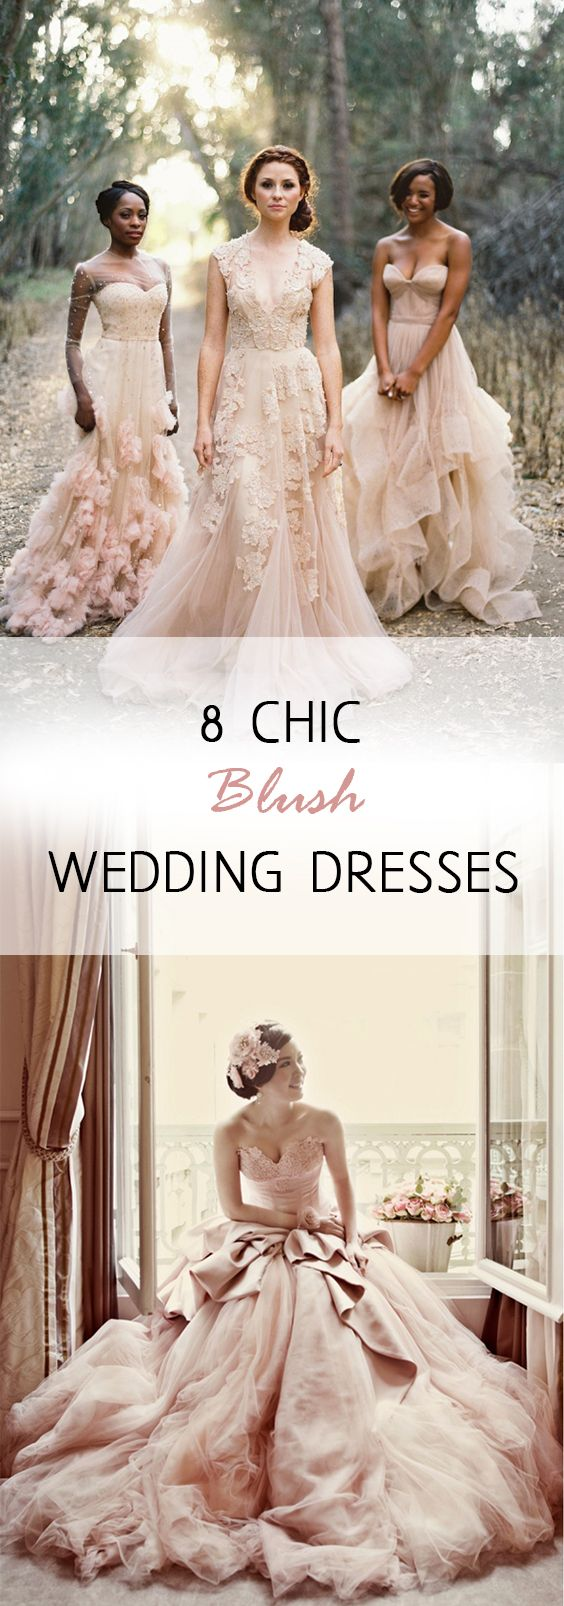 Non traditional wedding dress   Chic Blush Wedding Dresses  Wedding colour schemes Blush wedding